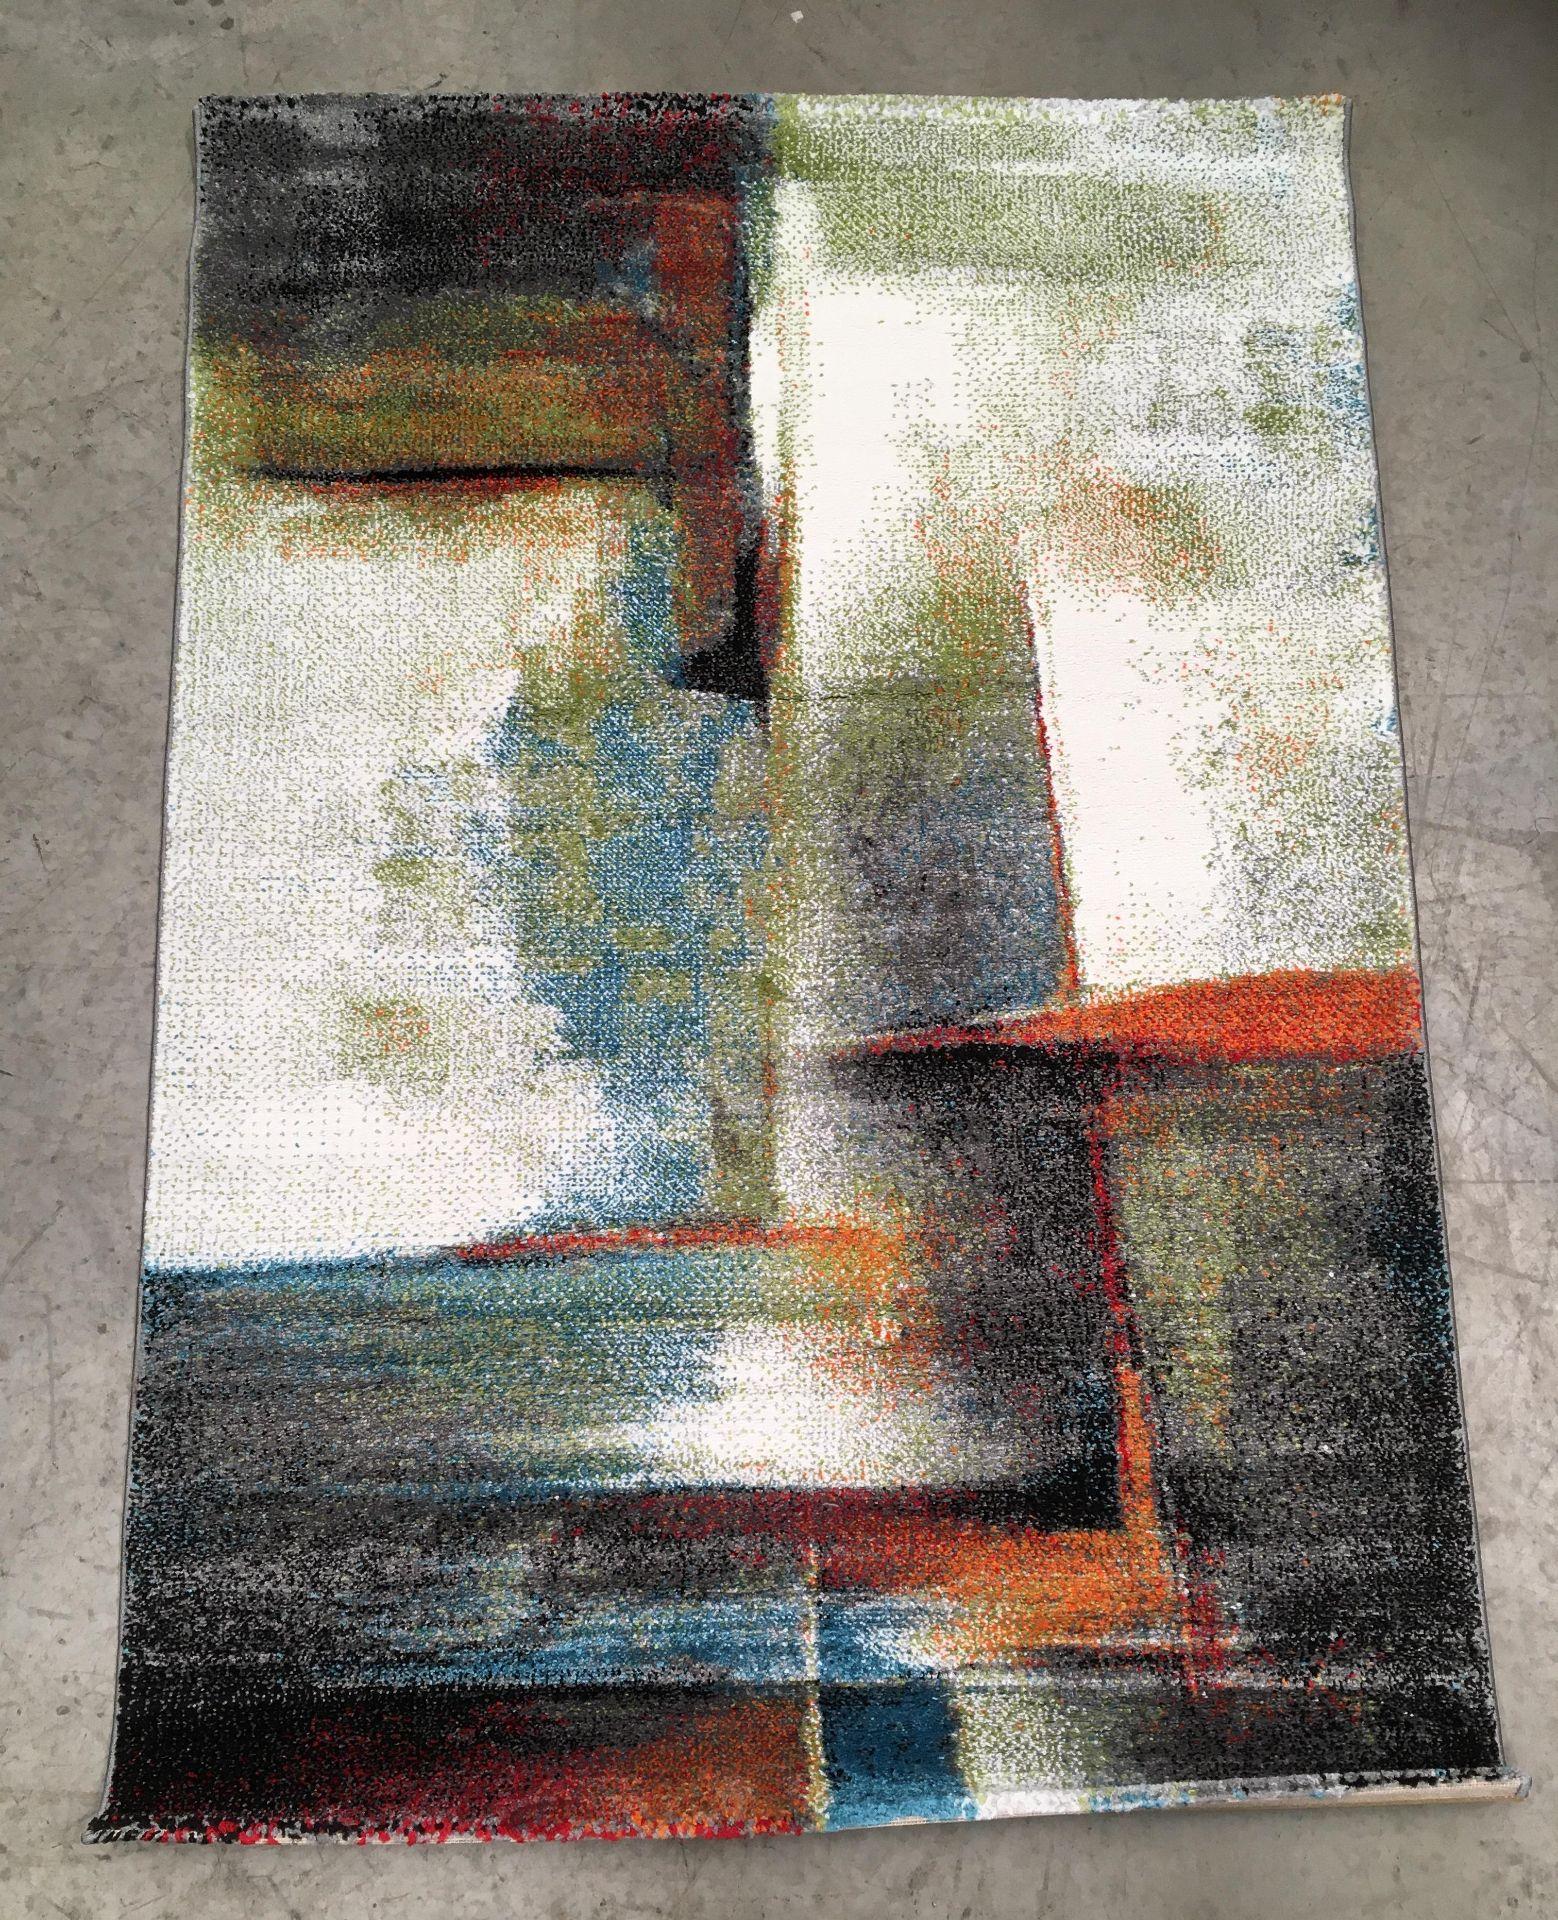 Lot 11 - A Paco Home Brilliance SV 710 multicoloured rug - 120cm x 170cm